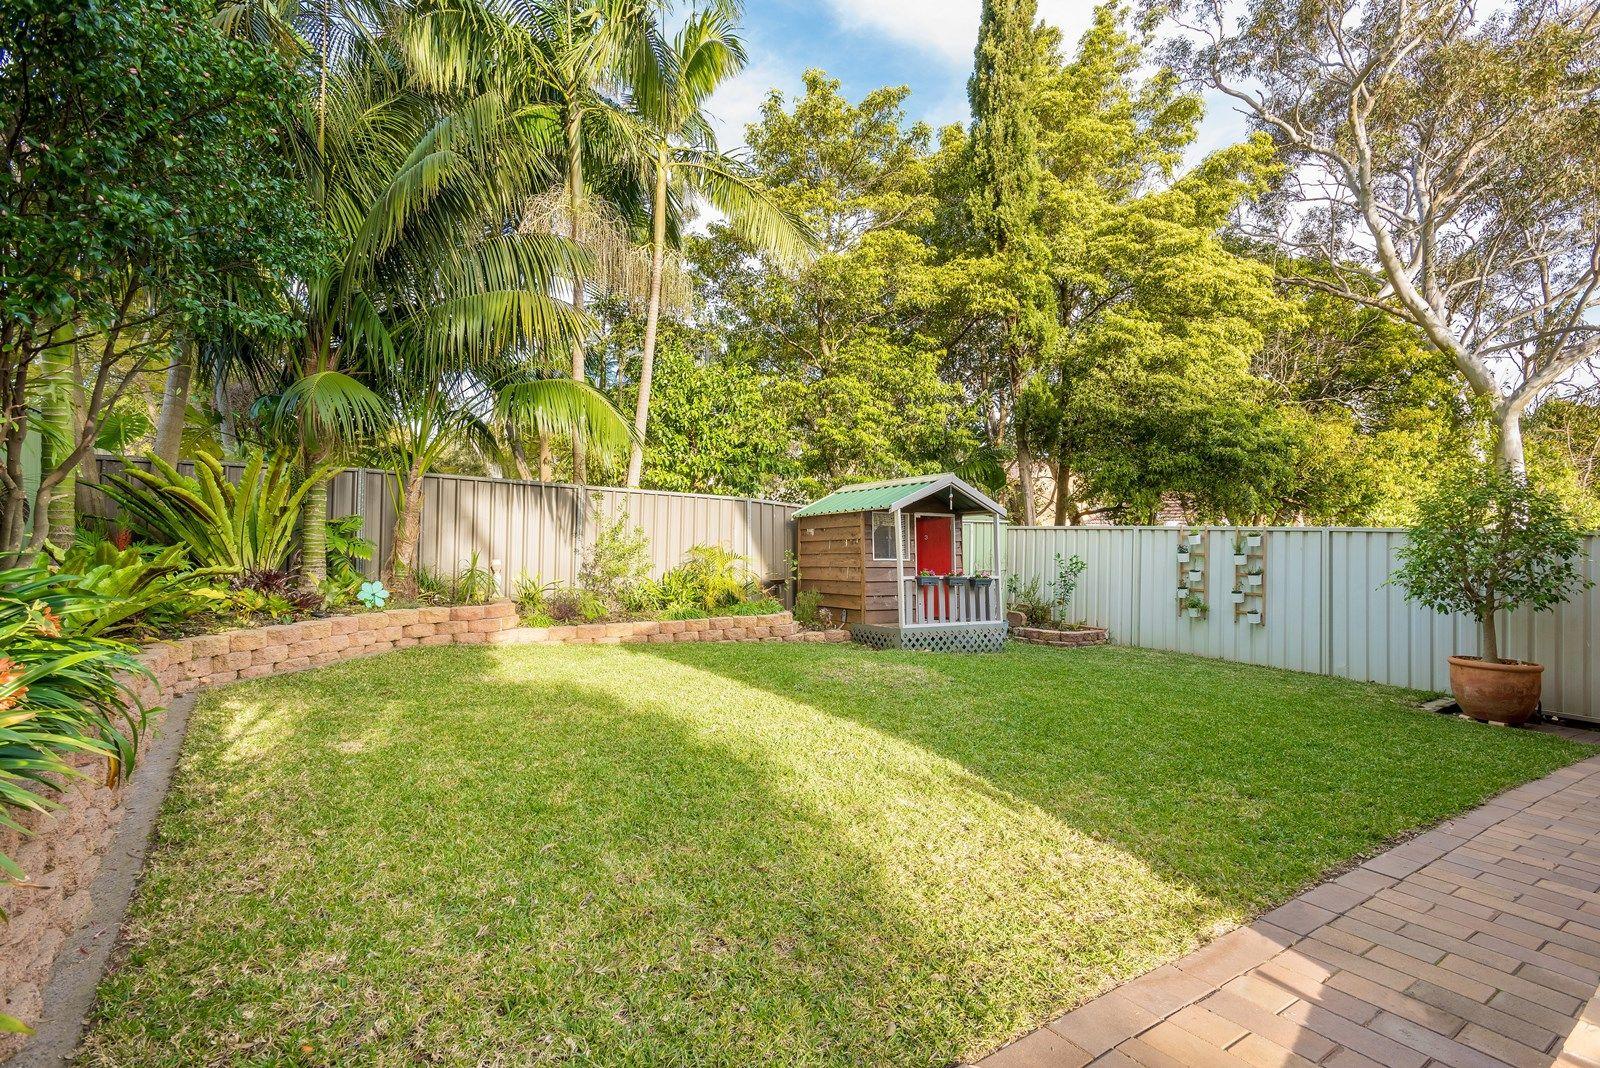 3/58 Taren Road, Caringbah South NSW 2229, Image 1